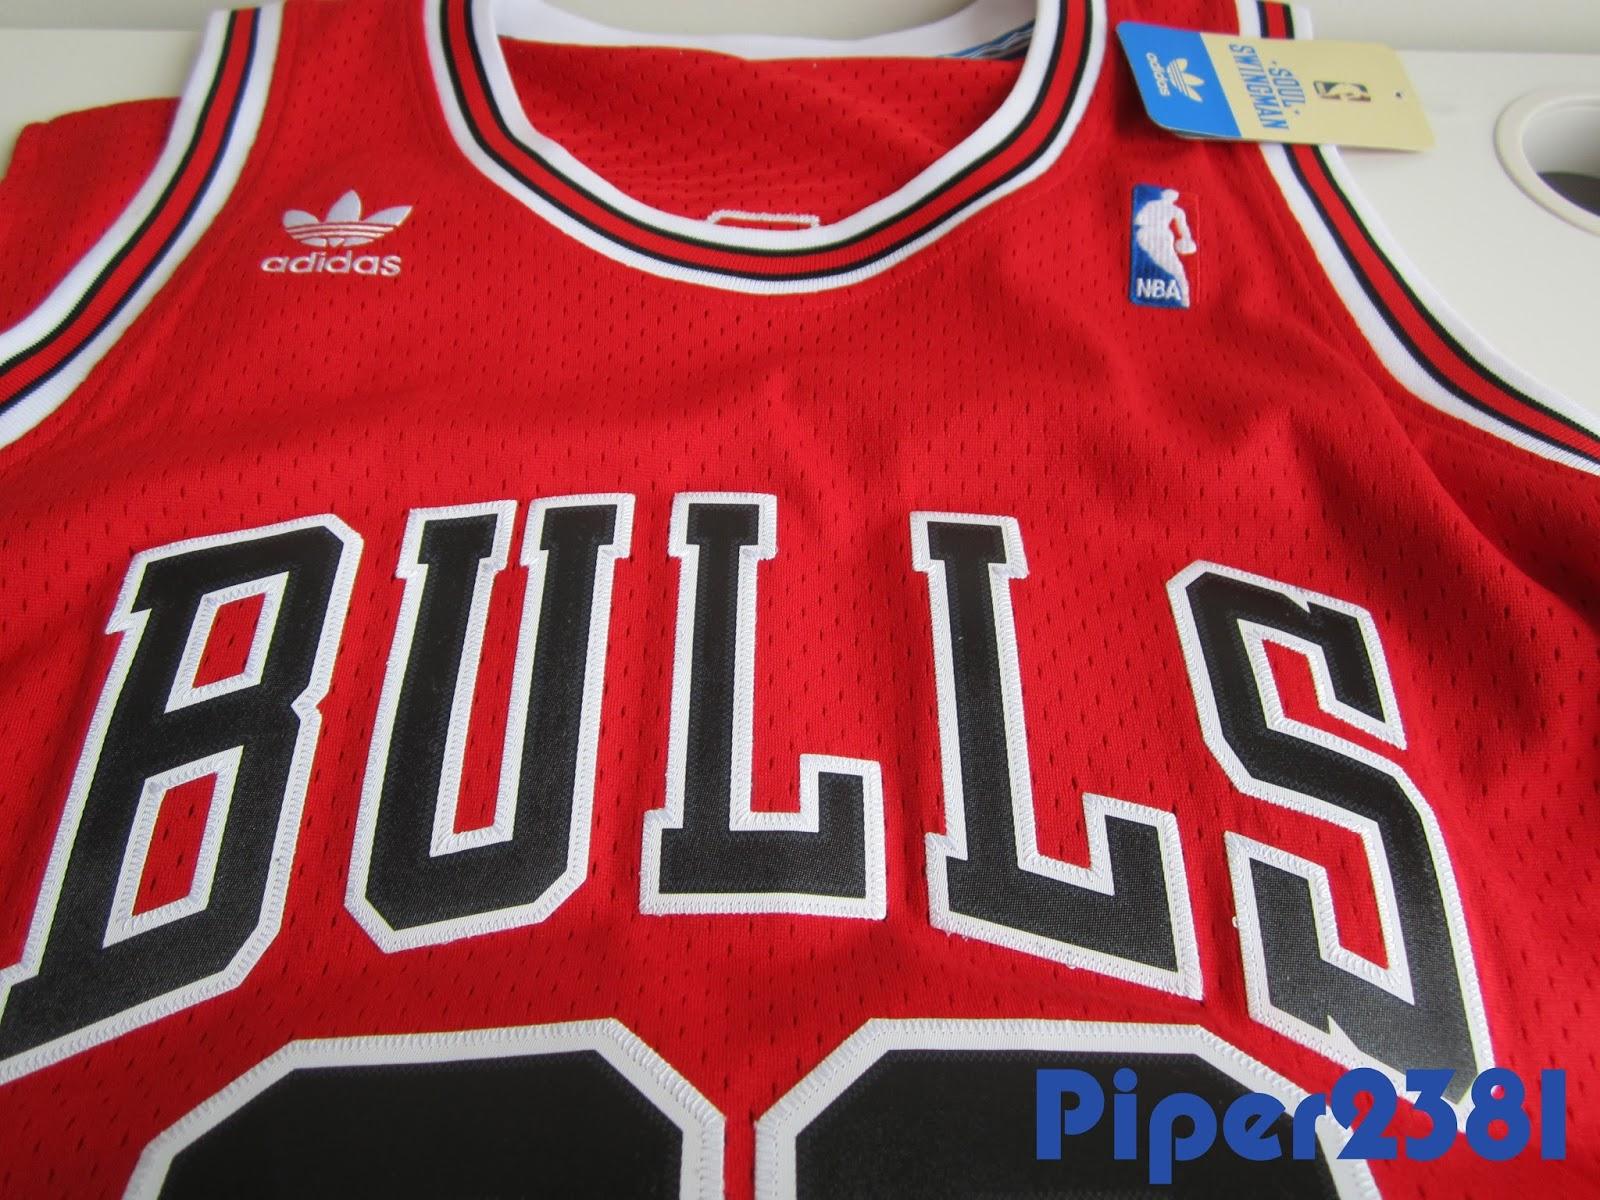 premium selection 6b366 8d711 Piper2381: Adidas Scottie Pippen Jersey